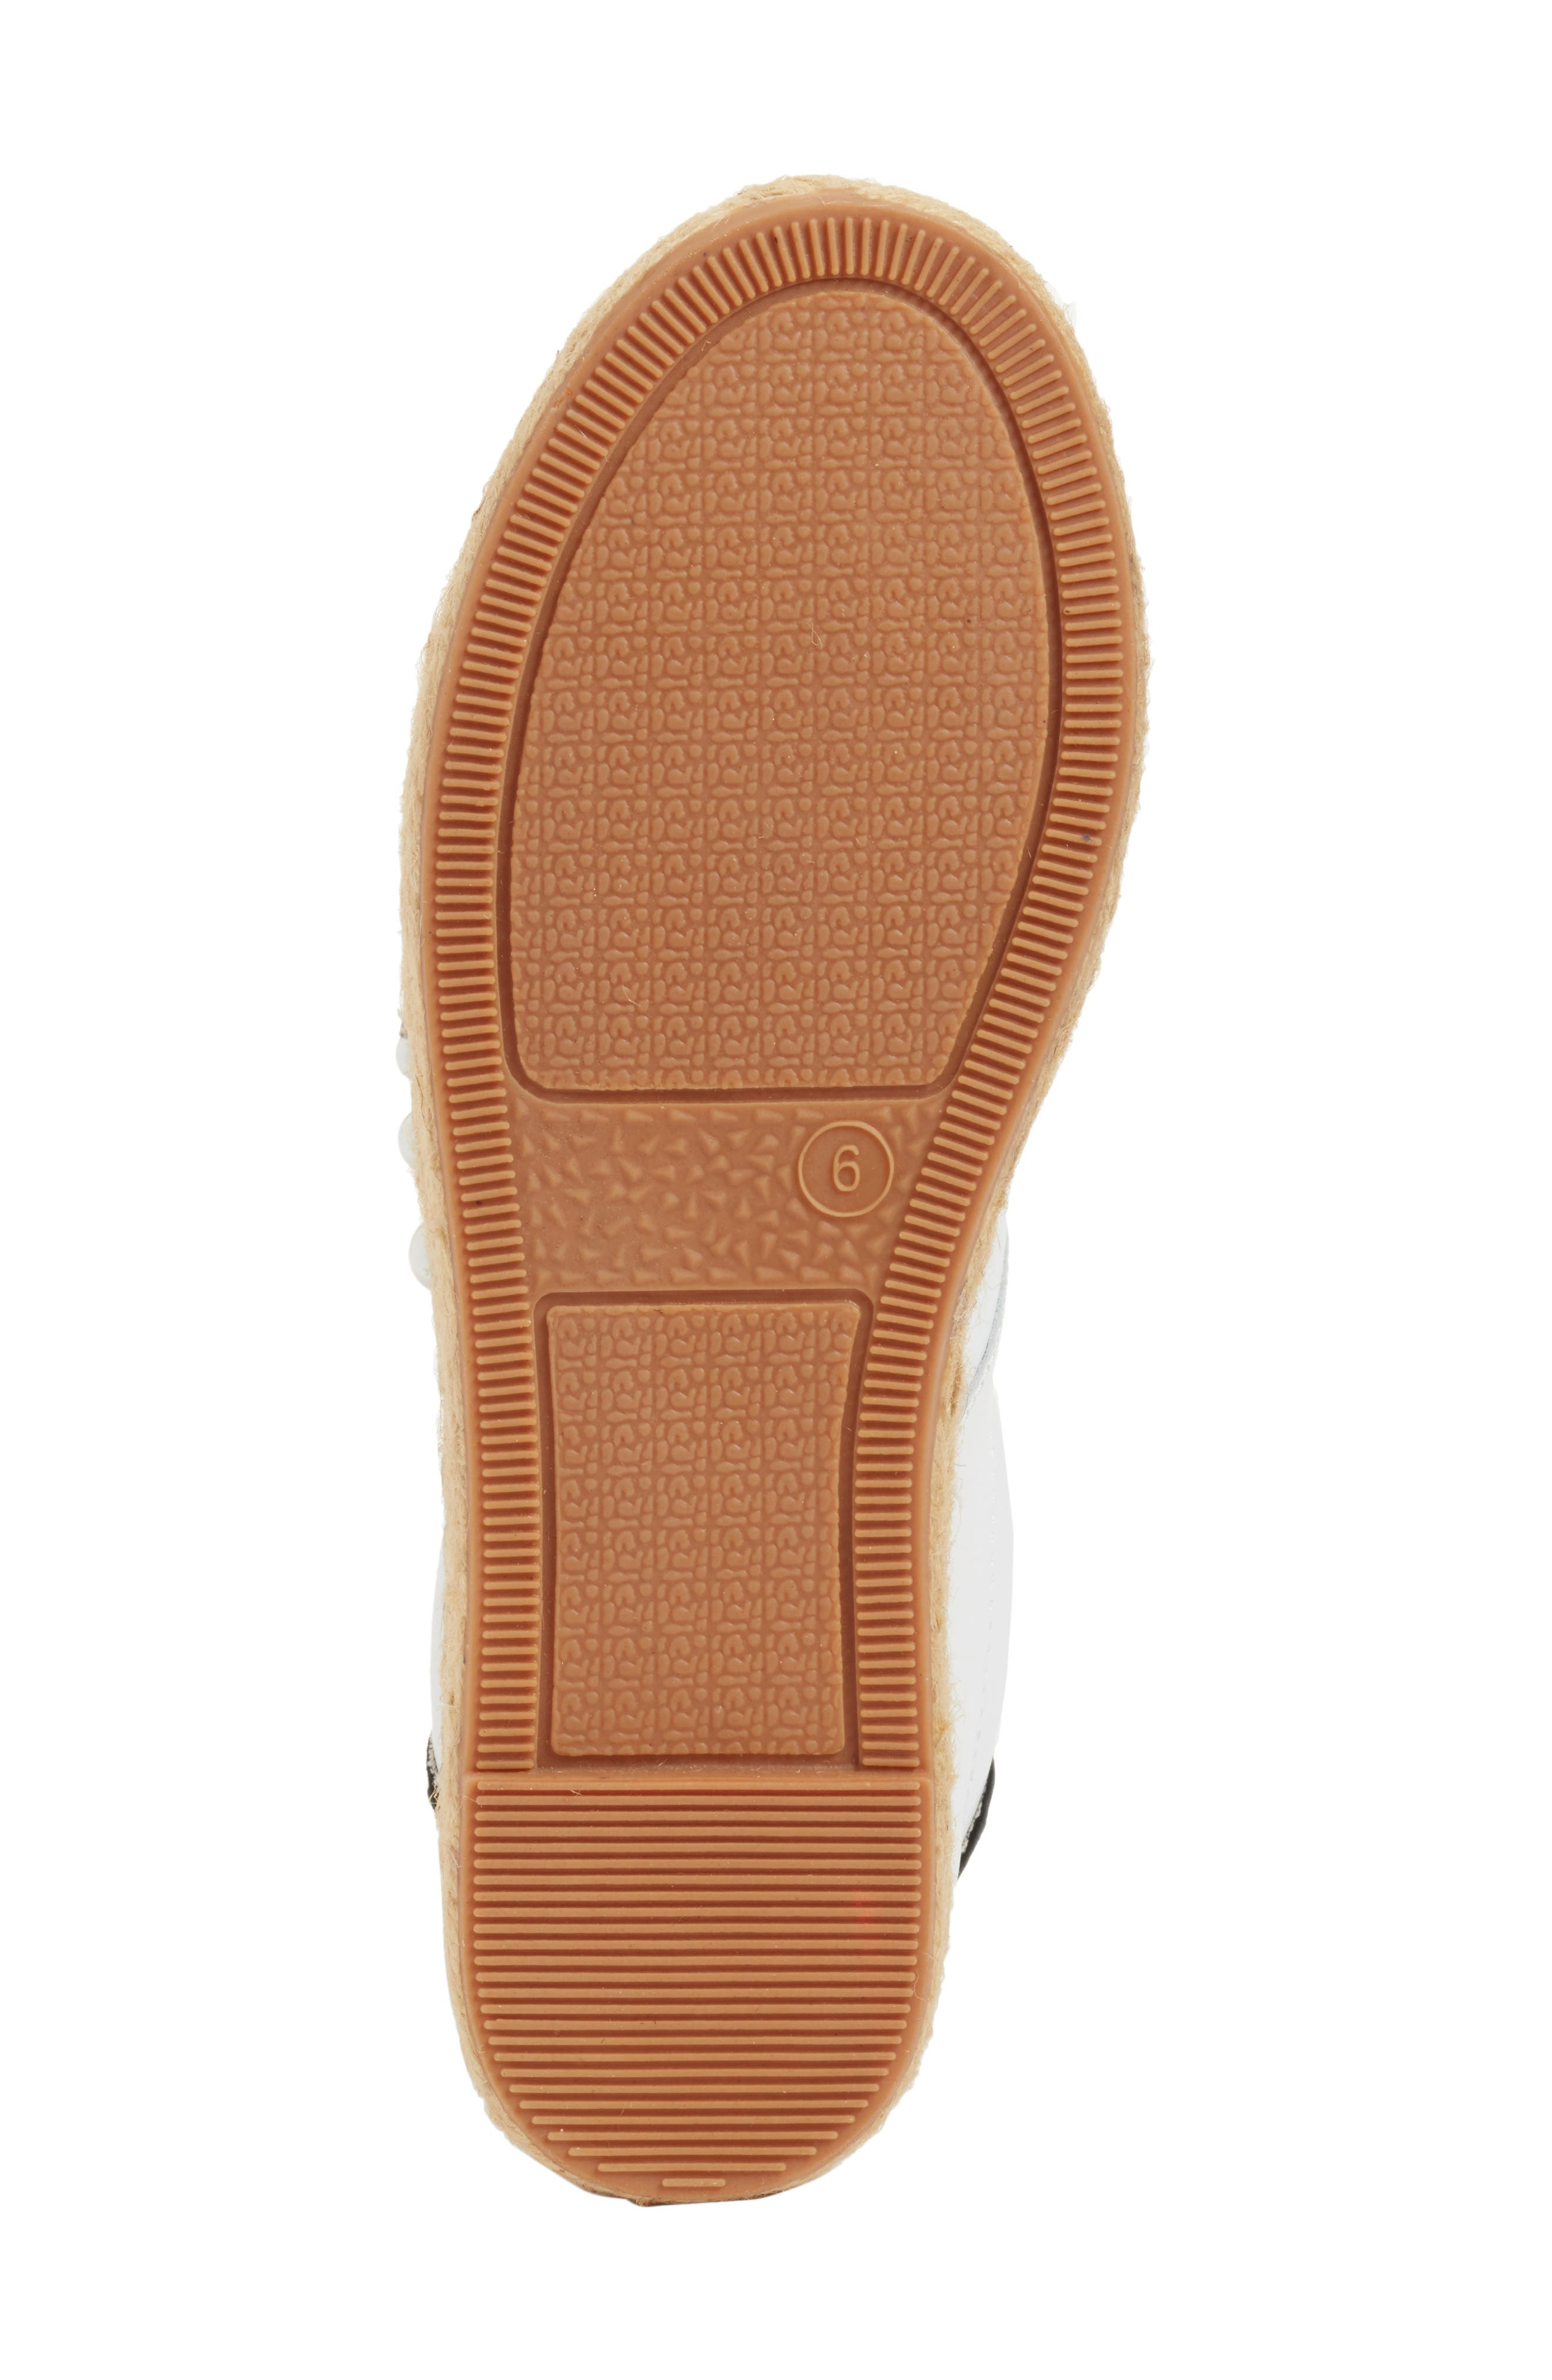 Marge Espadrille Platform Sneaker,                             Alternate thumbnail 6, color,                             White/ Navy Leather